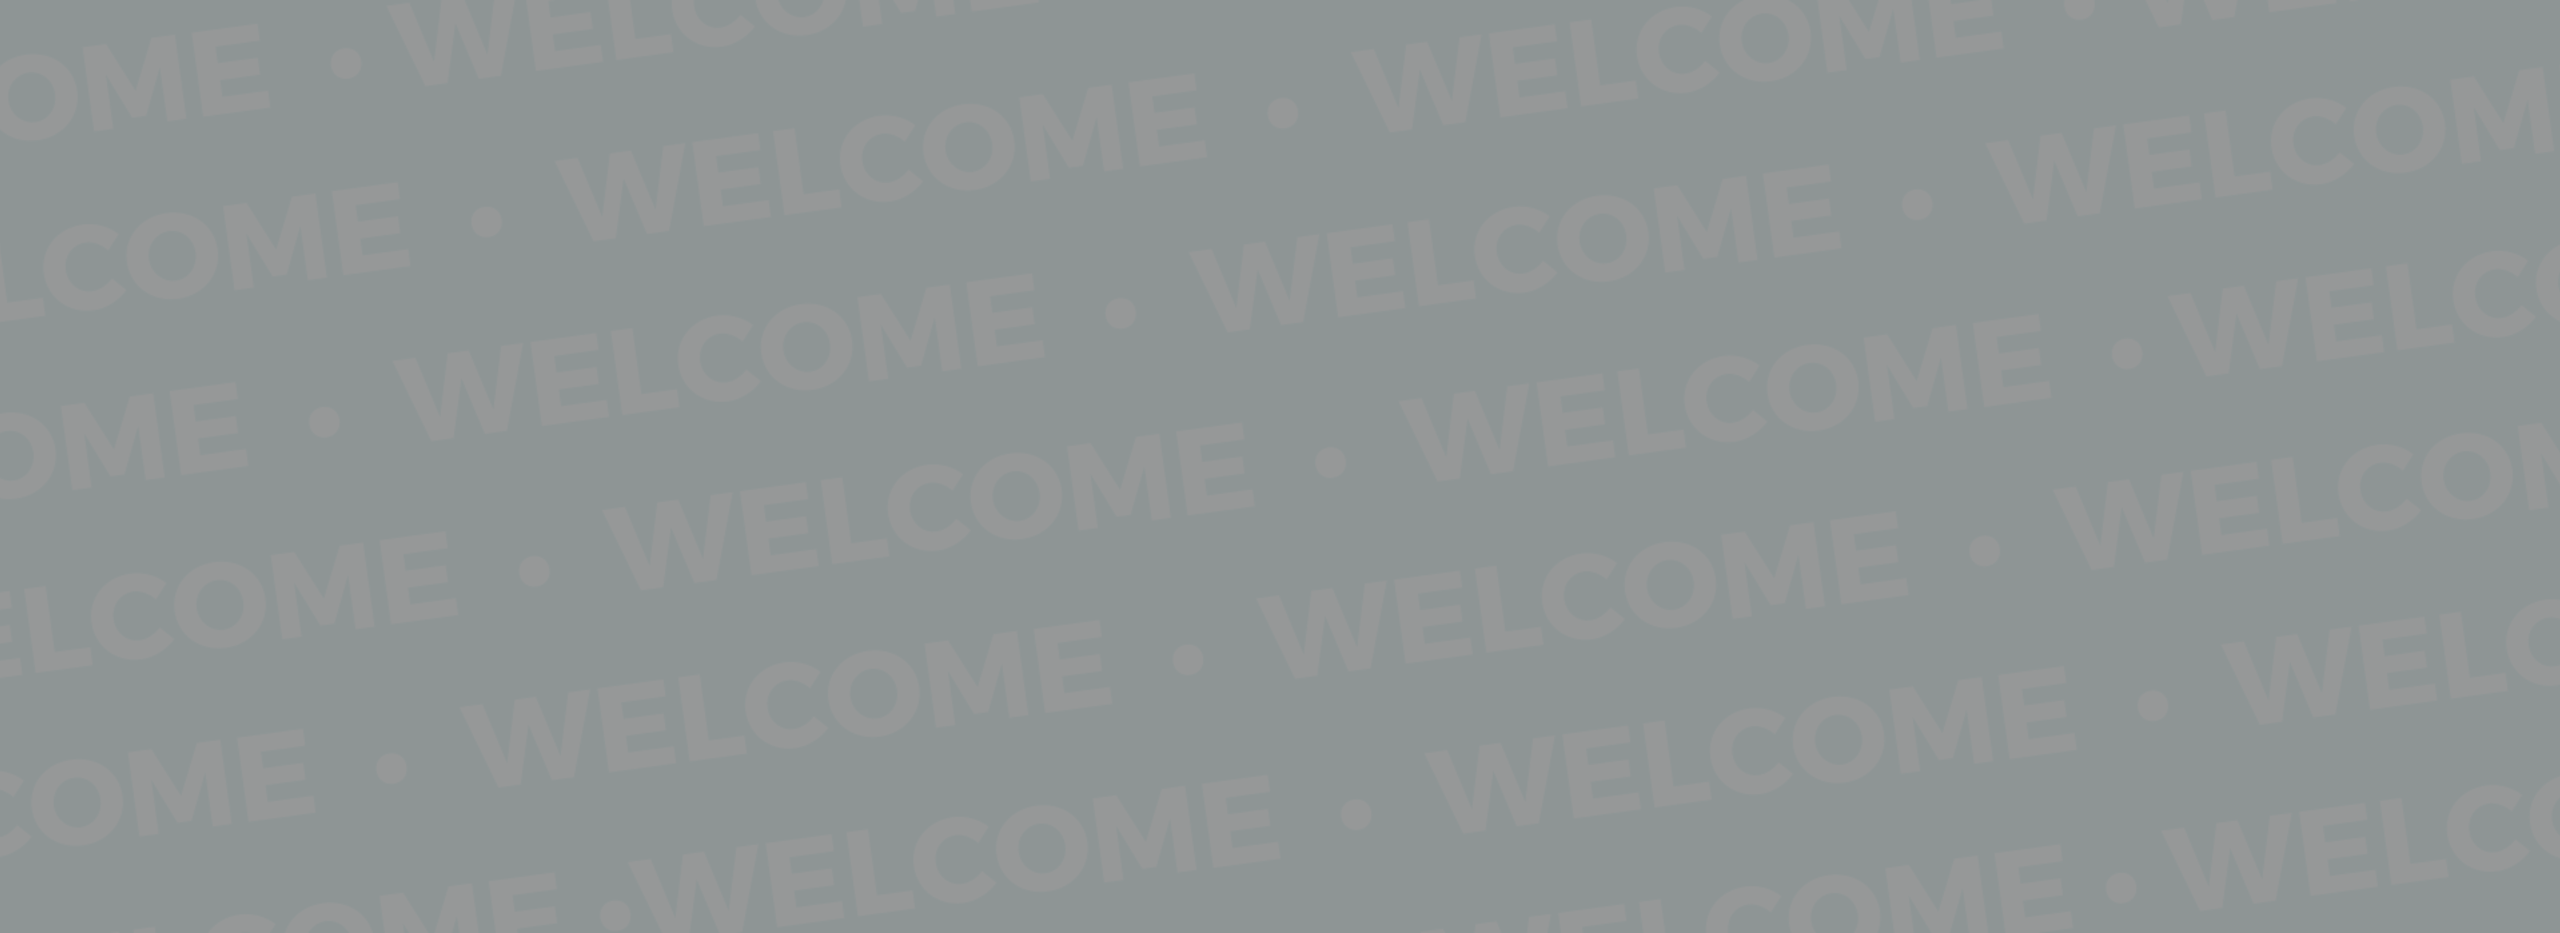 MRE | AP Welcomes New Agent Josh Beall